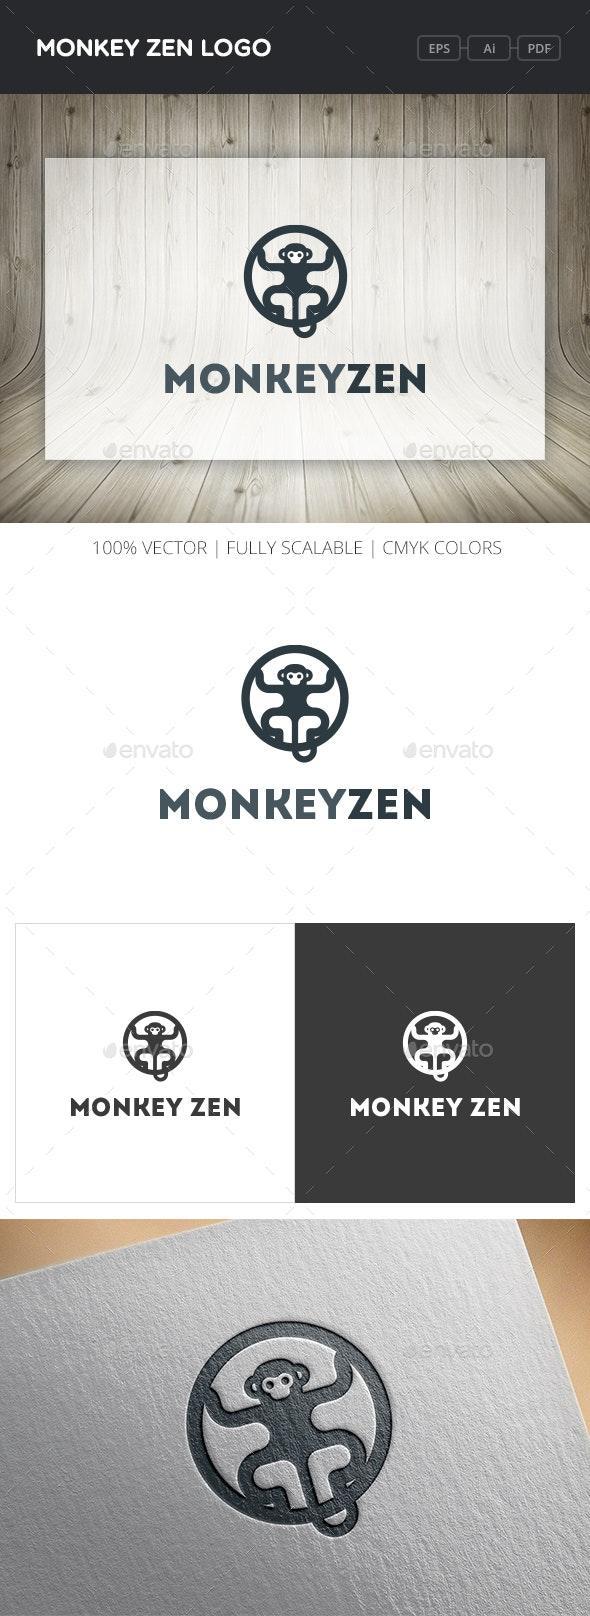 Monkey Zen Logo - Animals Logo Templates